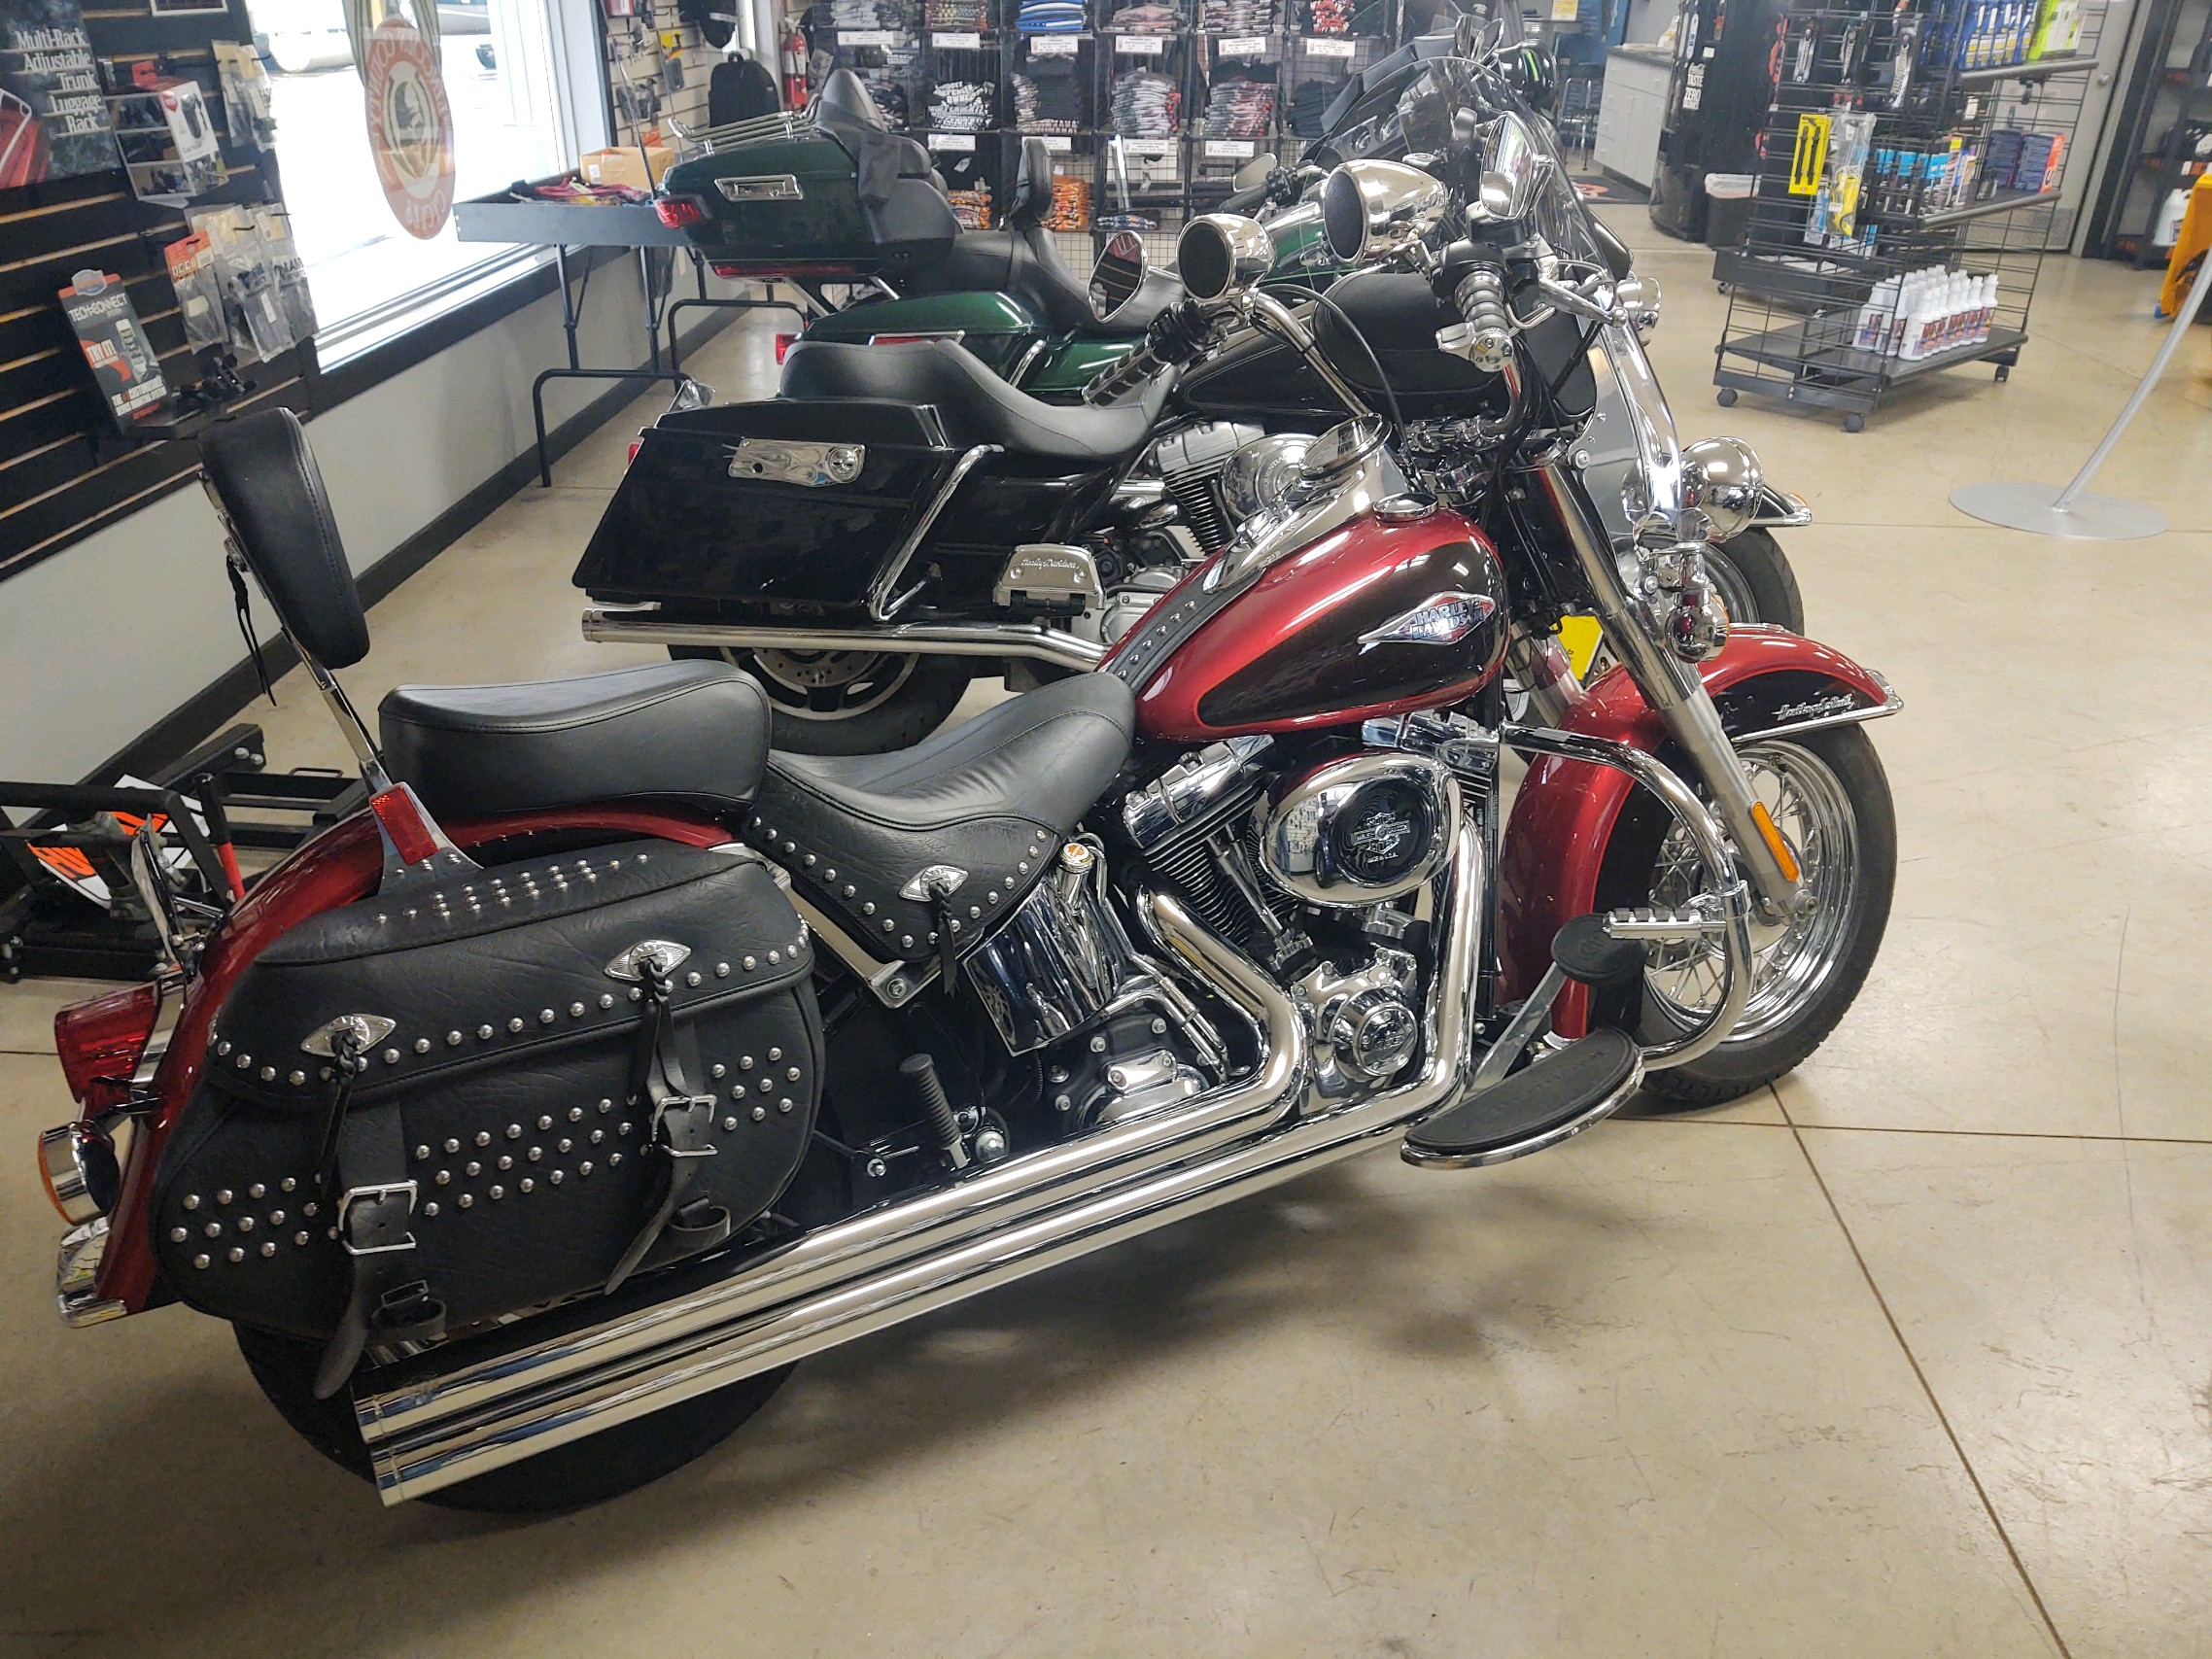 2012 Harley-Davidson Heritage Softail